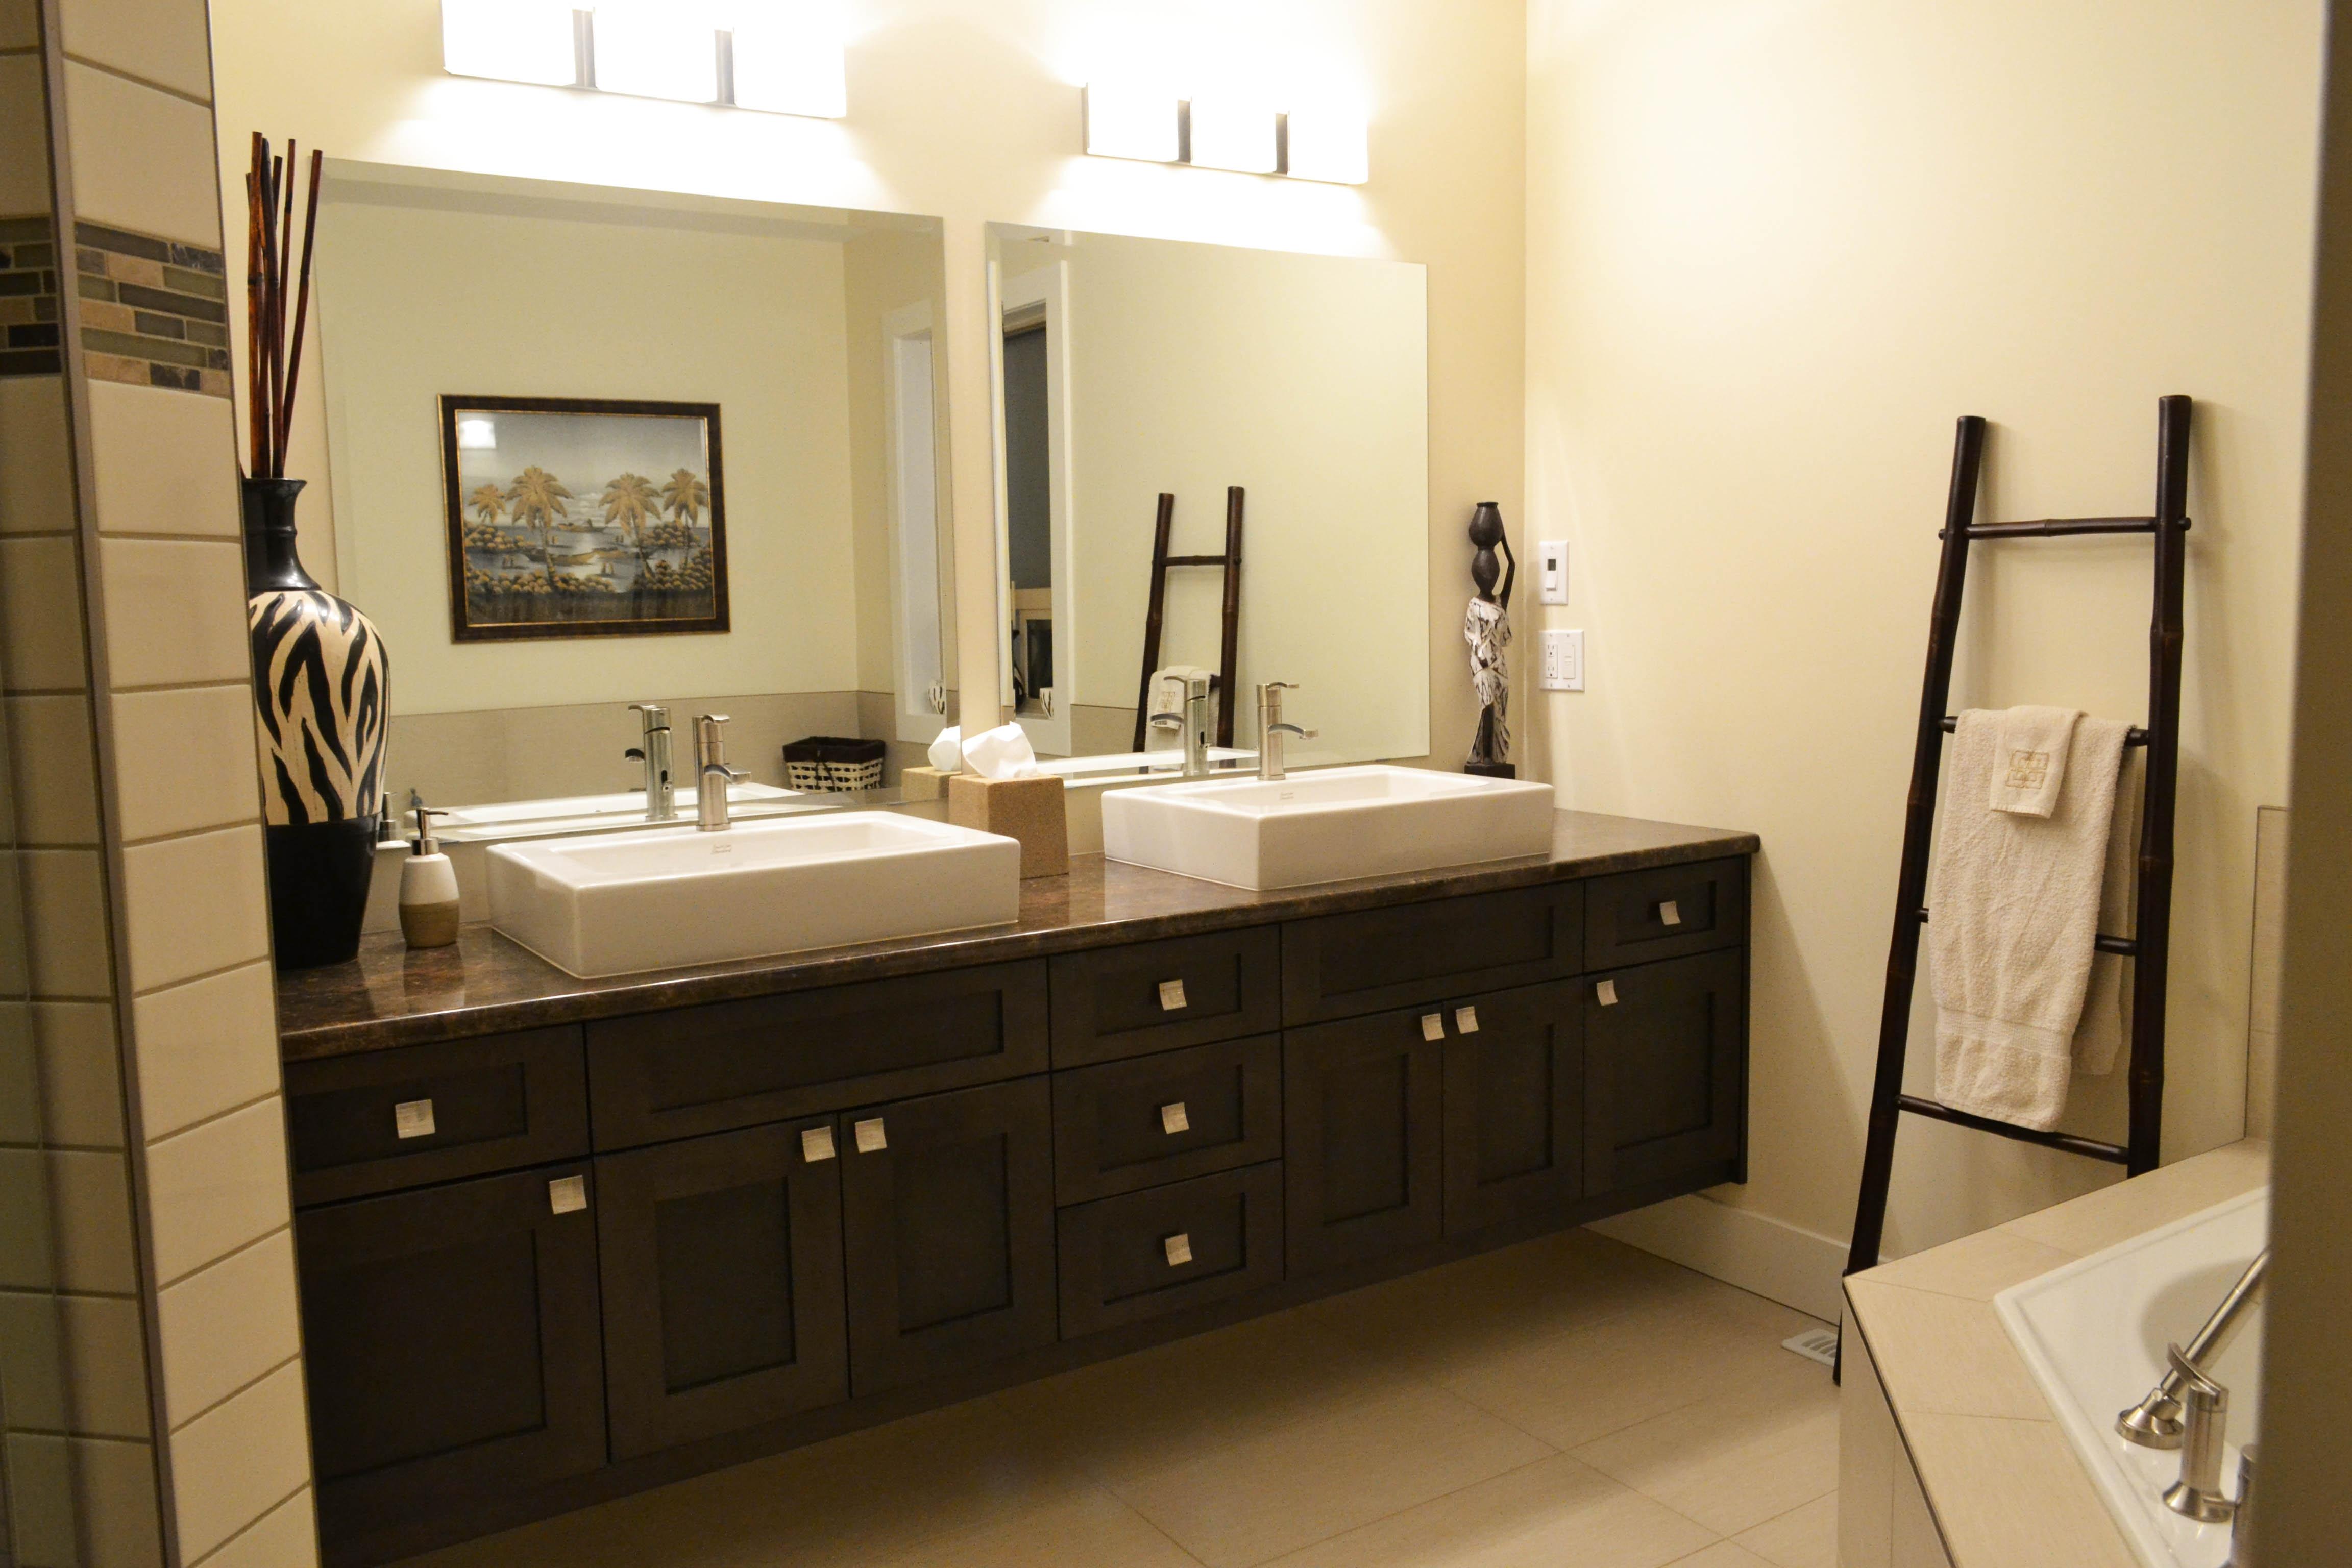 Permalink to Bathroom Mirrors Over Double Vanity